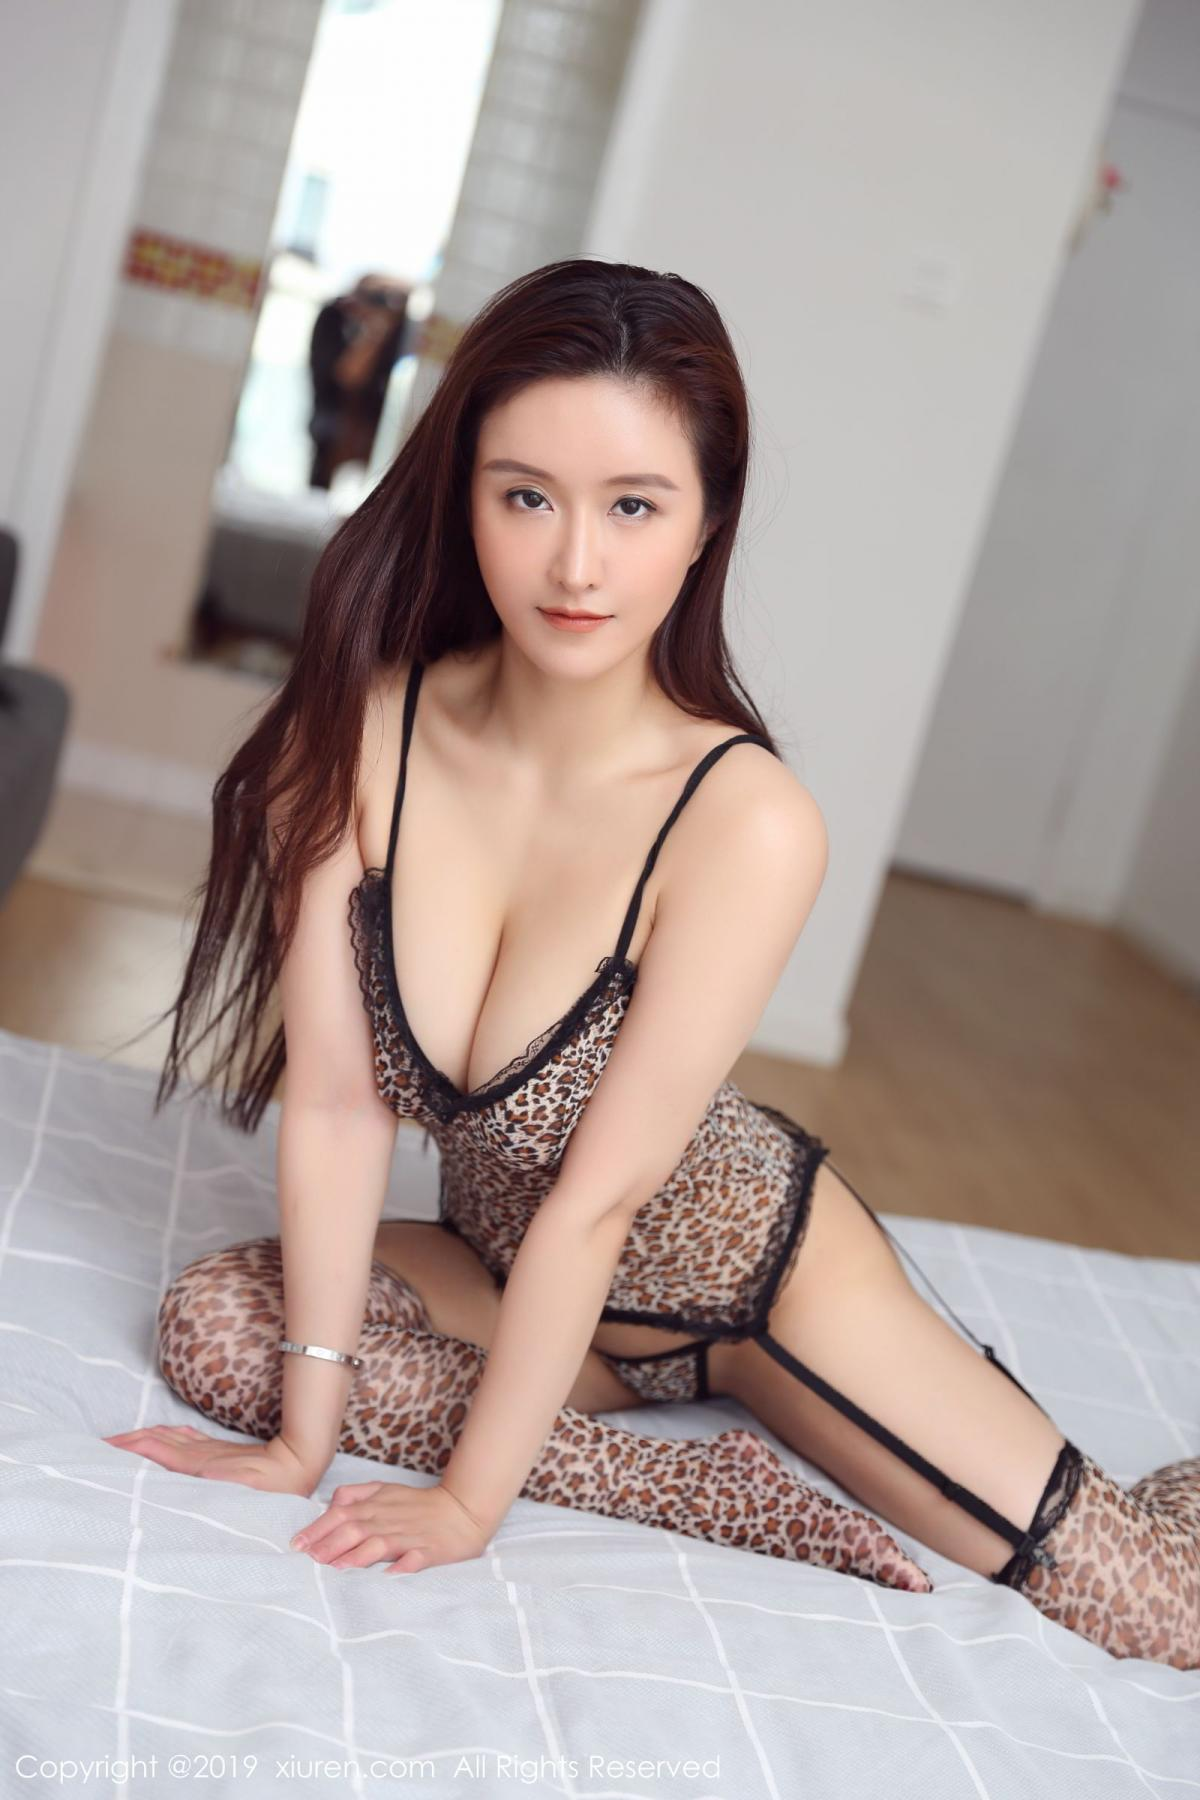 [XiuRen] Vol.1672 Jennanni Jen 13P, Jennanni Jen, Underwear, Xiuren